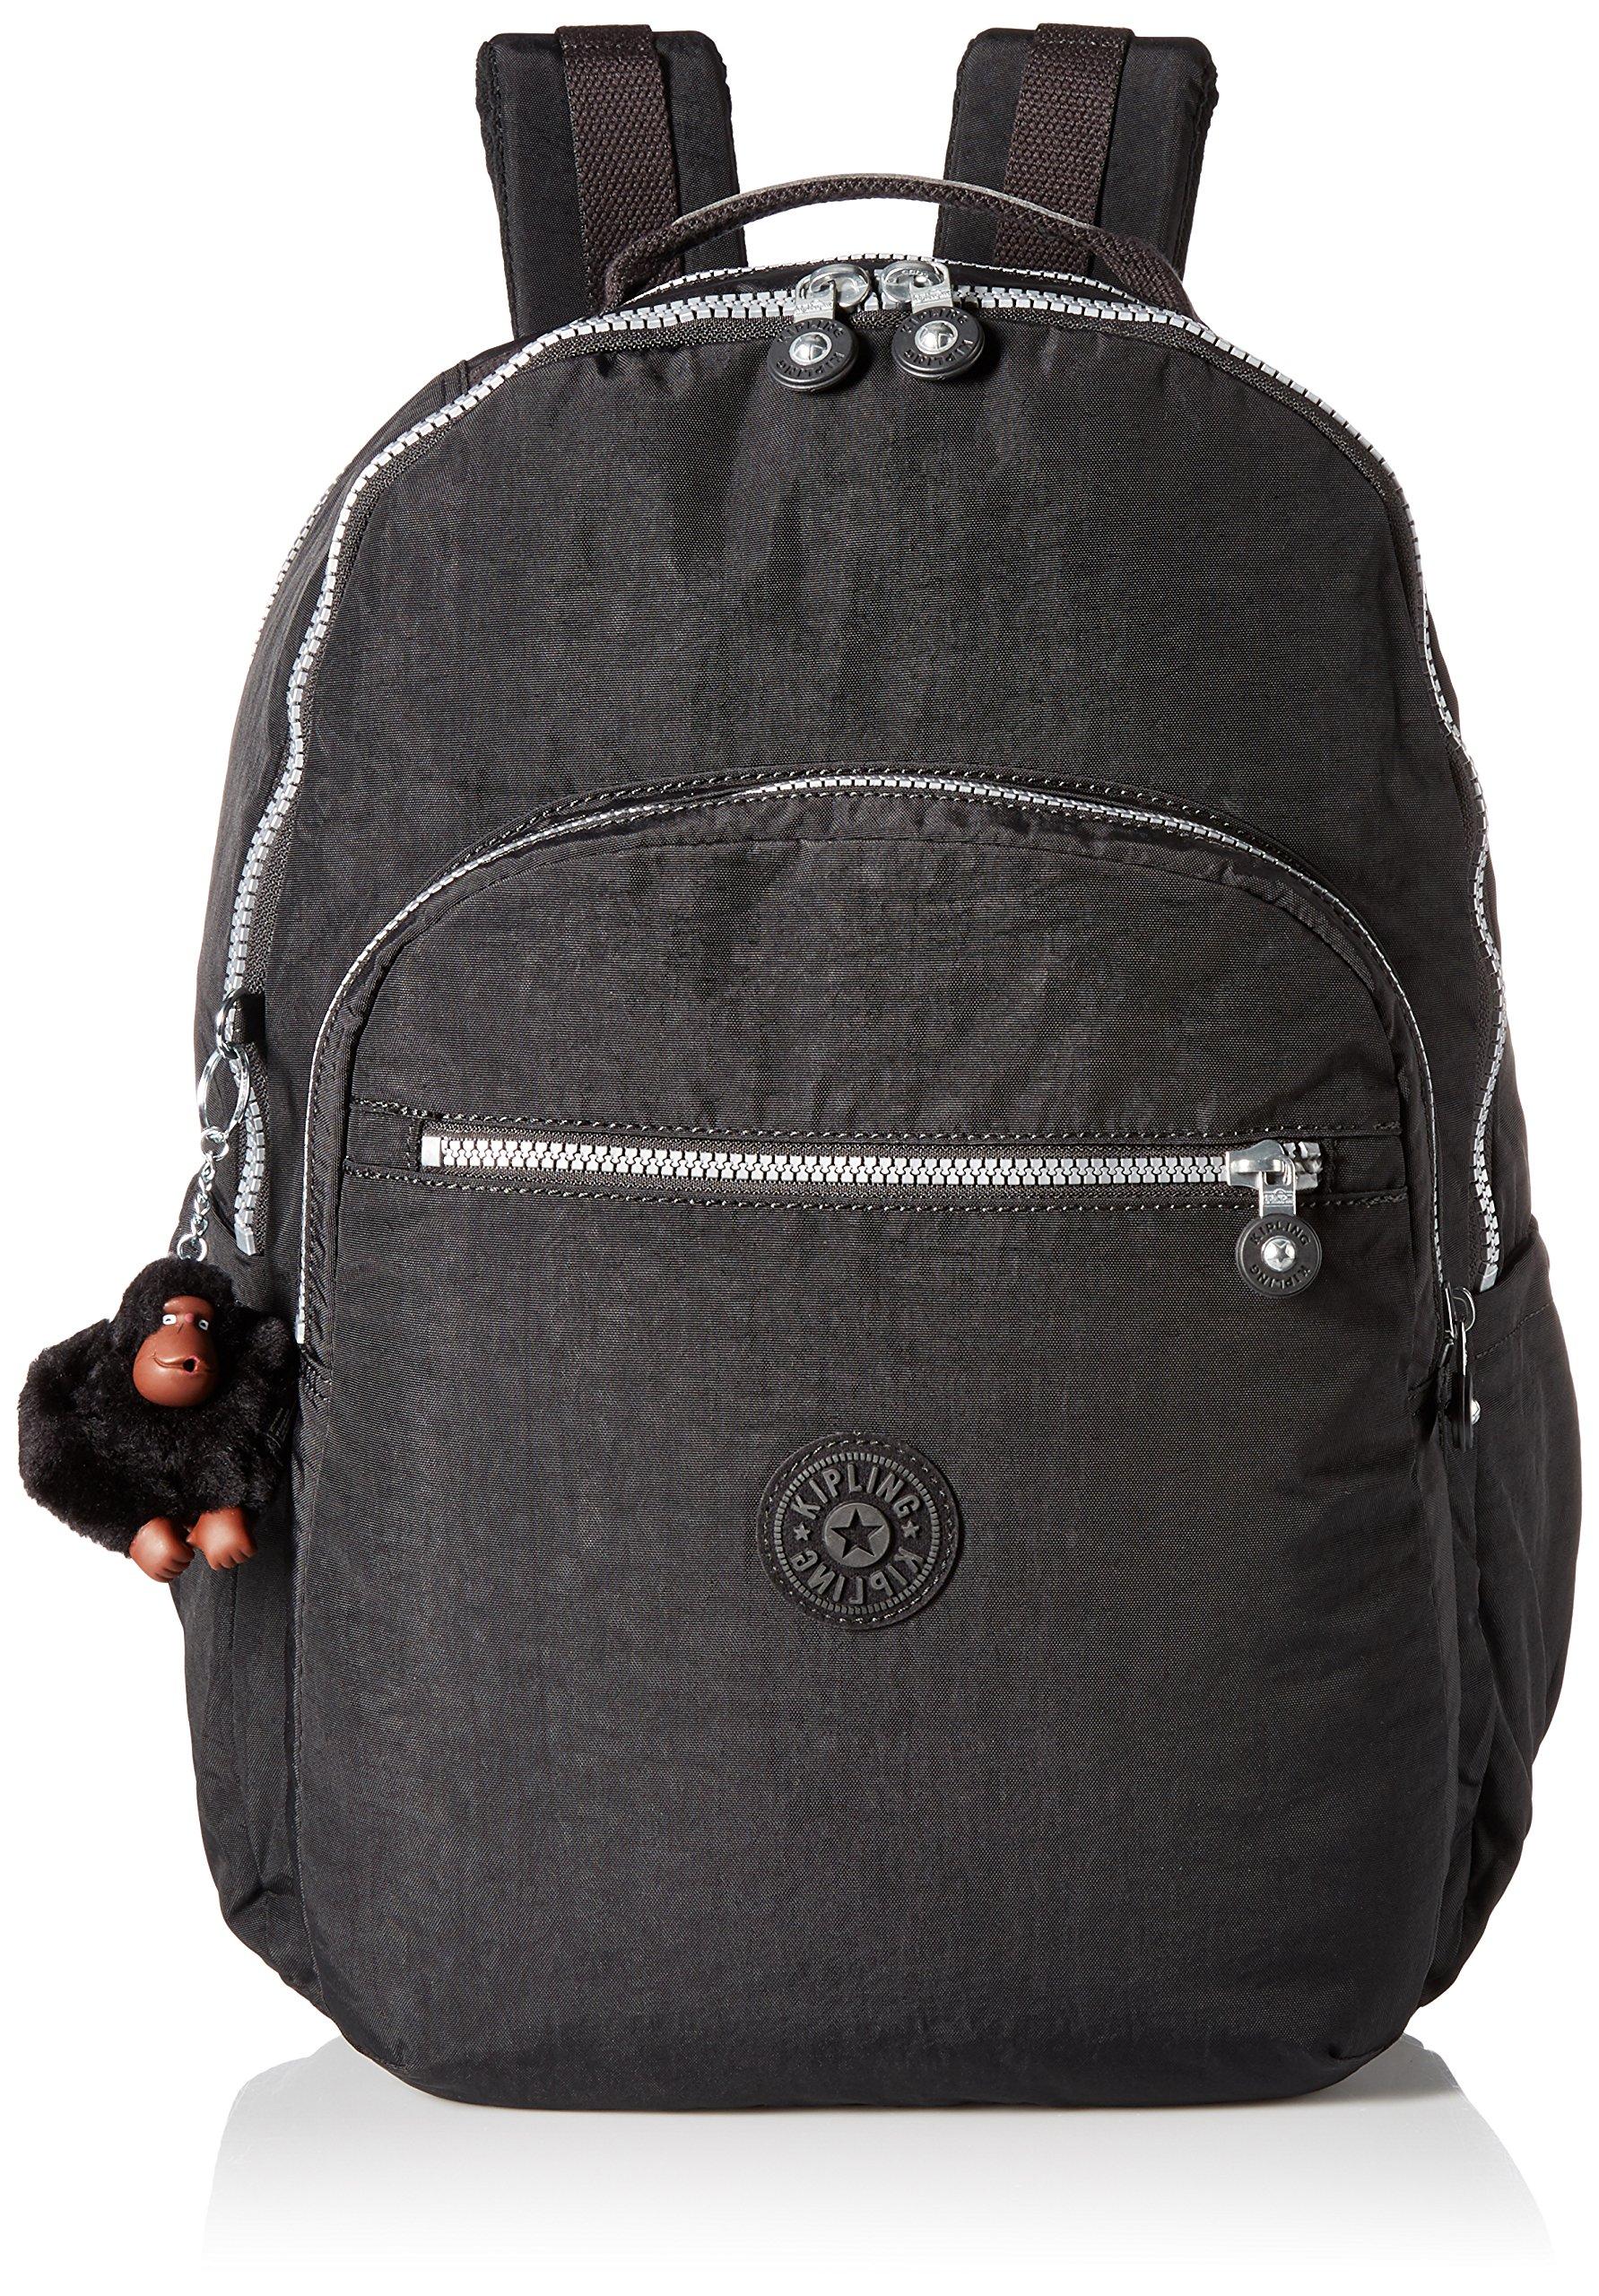 Seoul Extra Large Backpack Backpack, Black, One Size